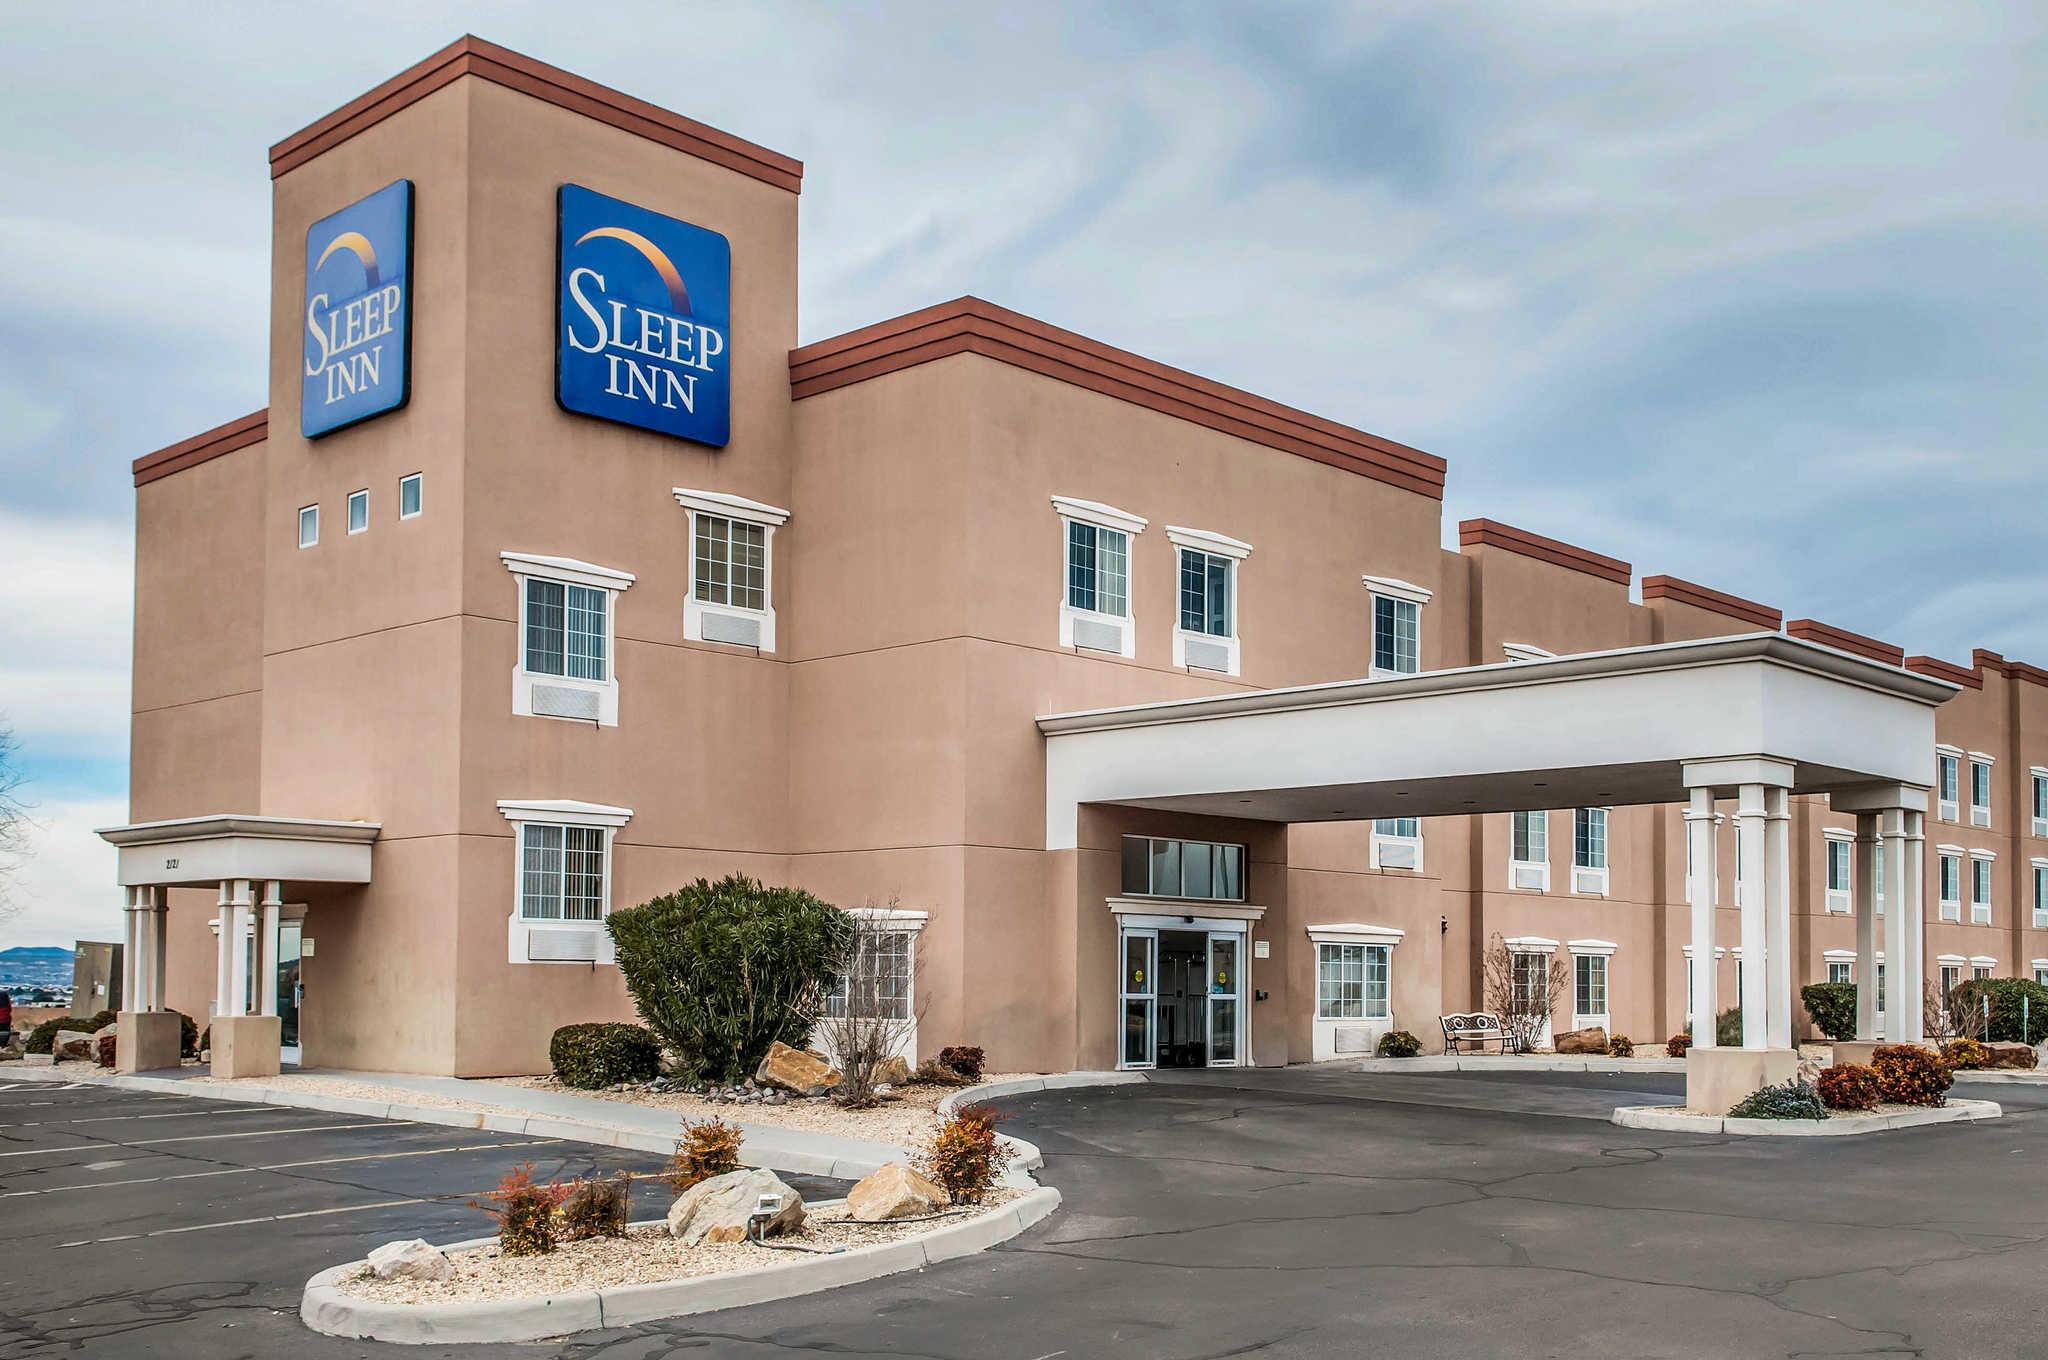 Sleep Inn University Las Cruces Nm Business Information